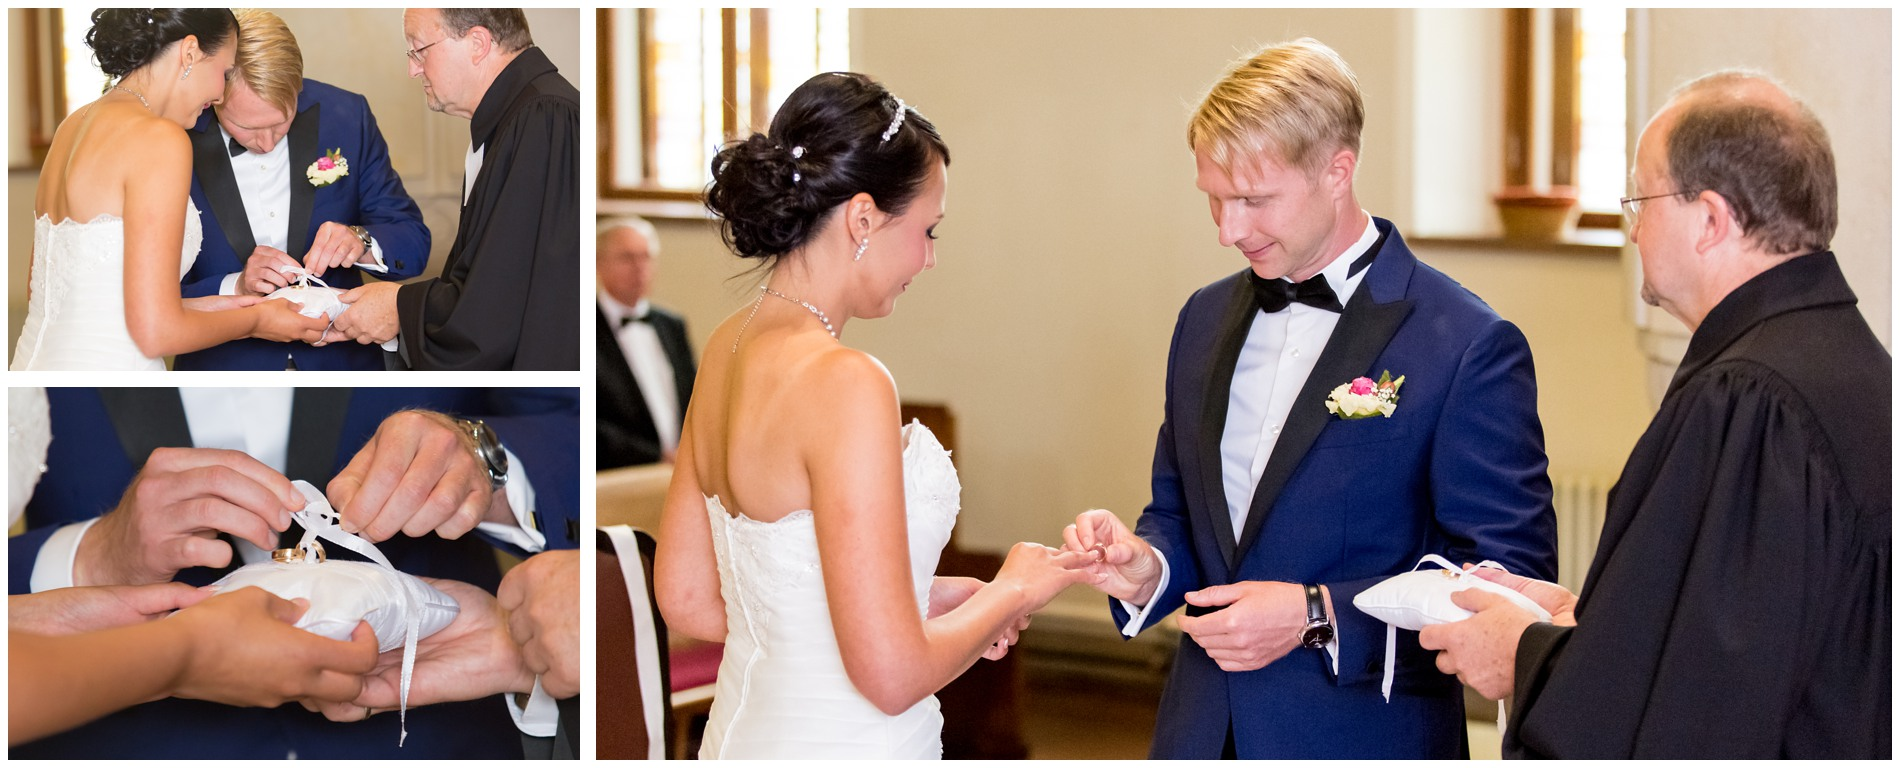 Hochzeitsfotos Zwickau - Hochzeitsfotograf Stephanie Scharschmidt